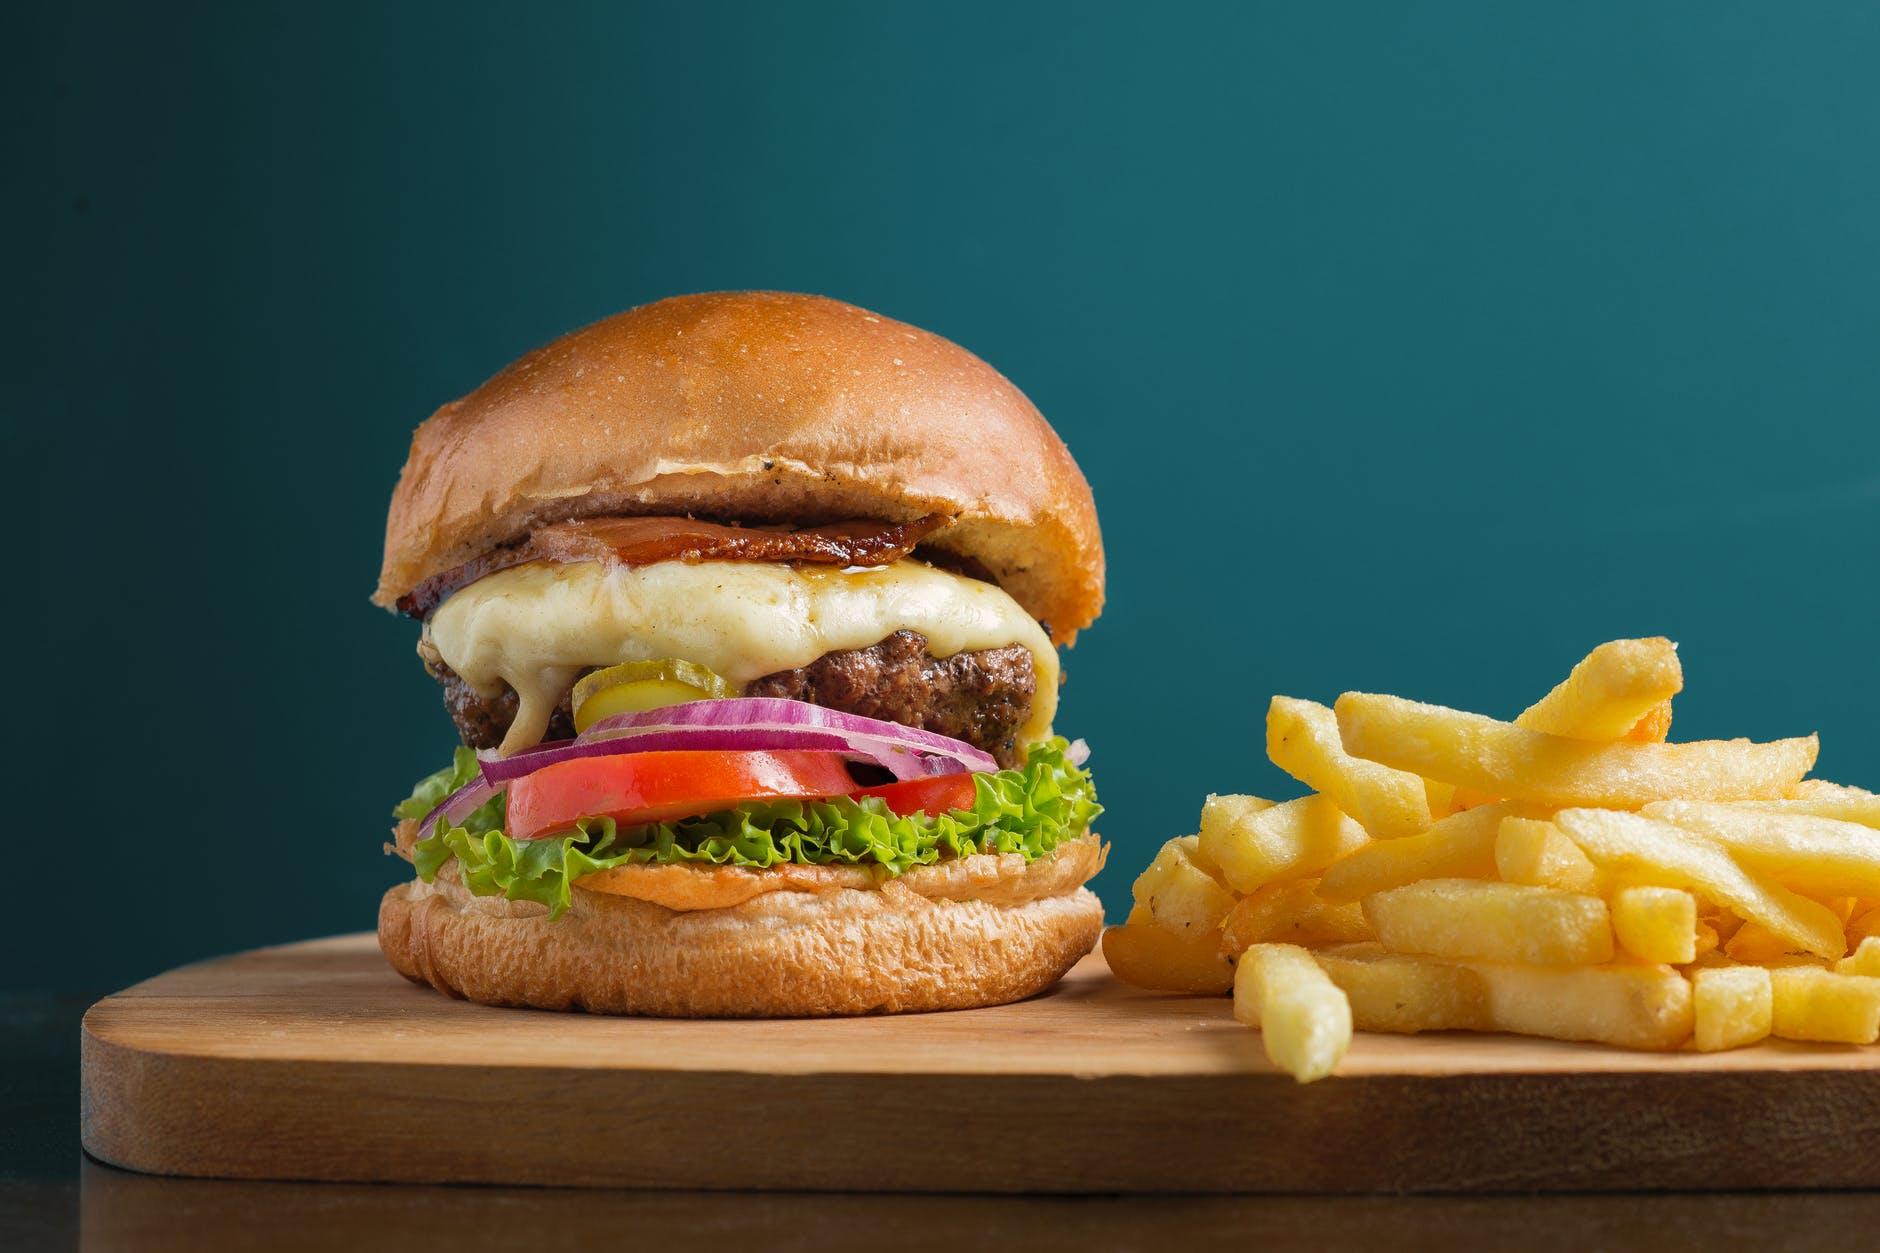 Uniwell Lynx Fast Food Software